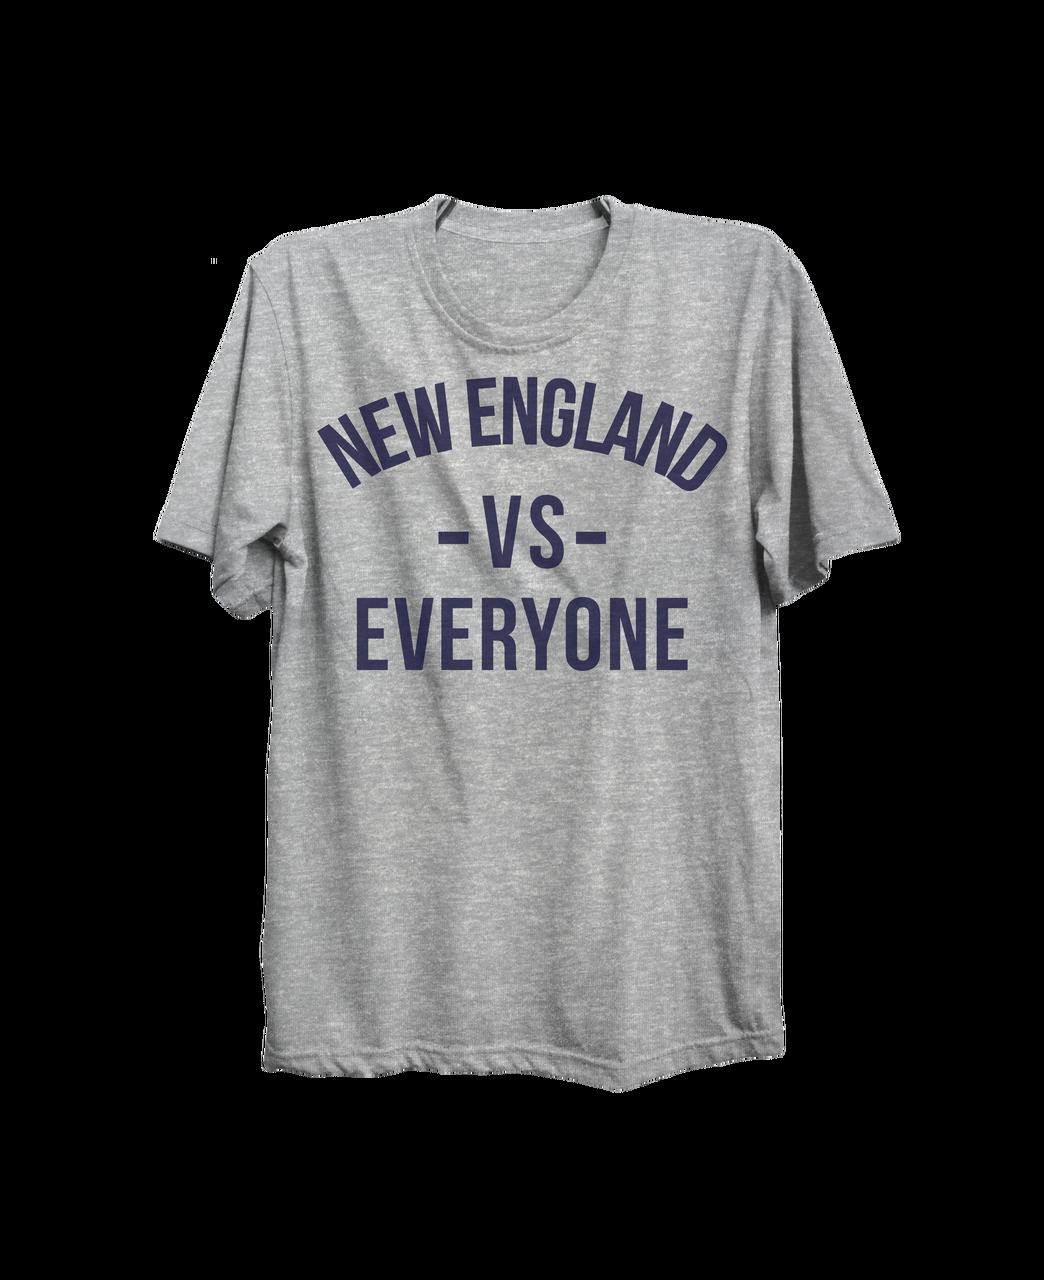 huge selection of d4221 c4cd5 NEW ENGLAND vs EVERYONE T-Shirt